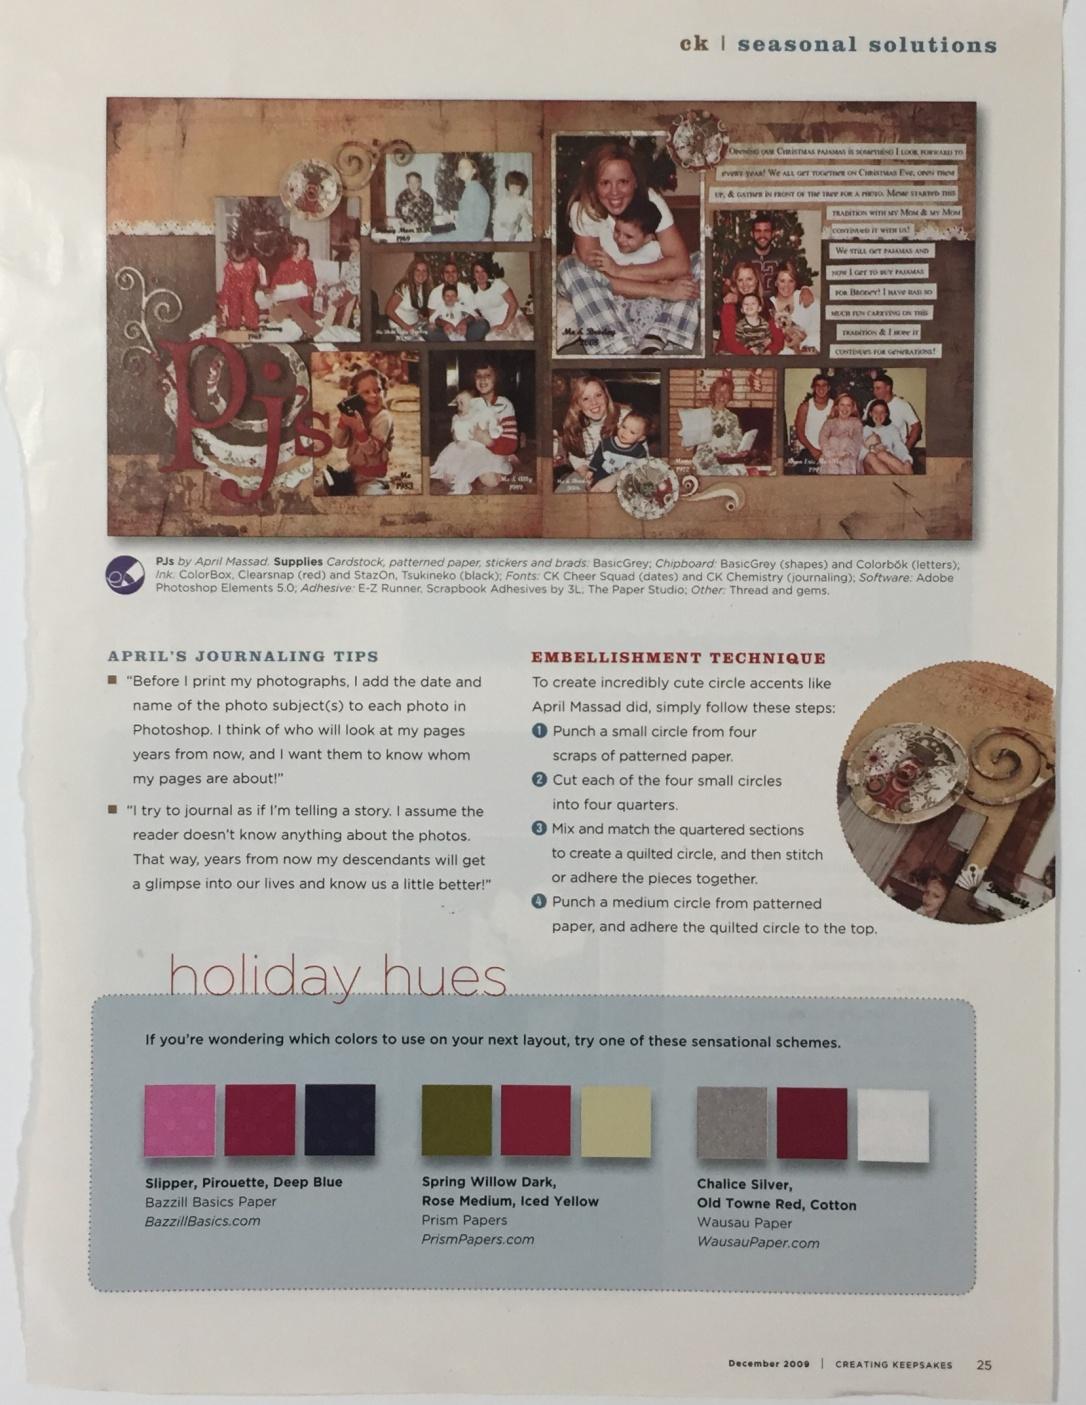 creating keepsakes palette holiday